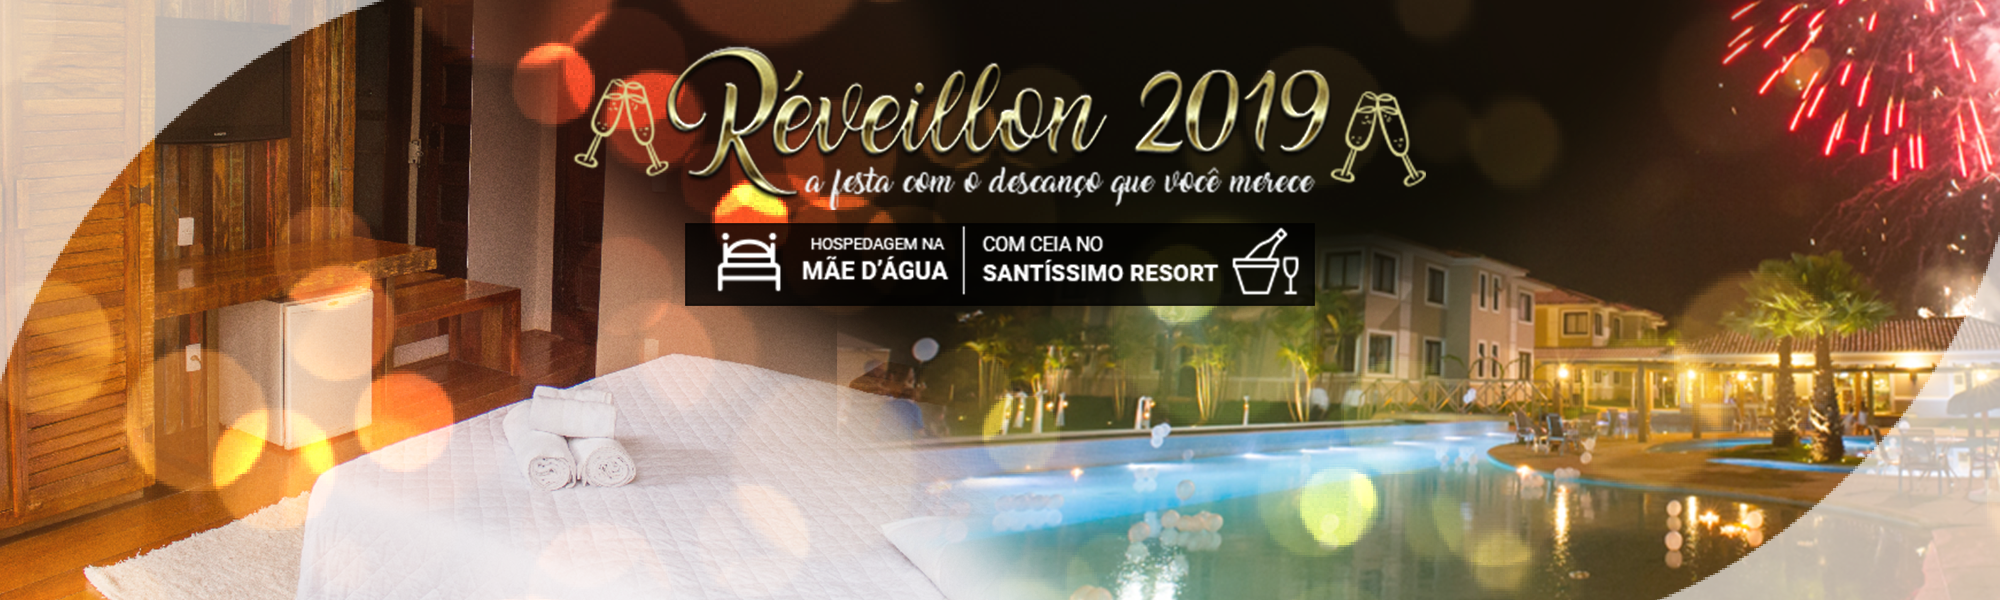 150-18_pmd_web_reveillon